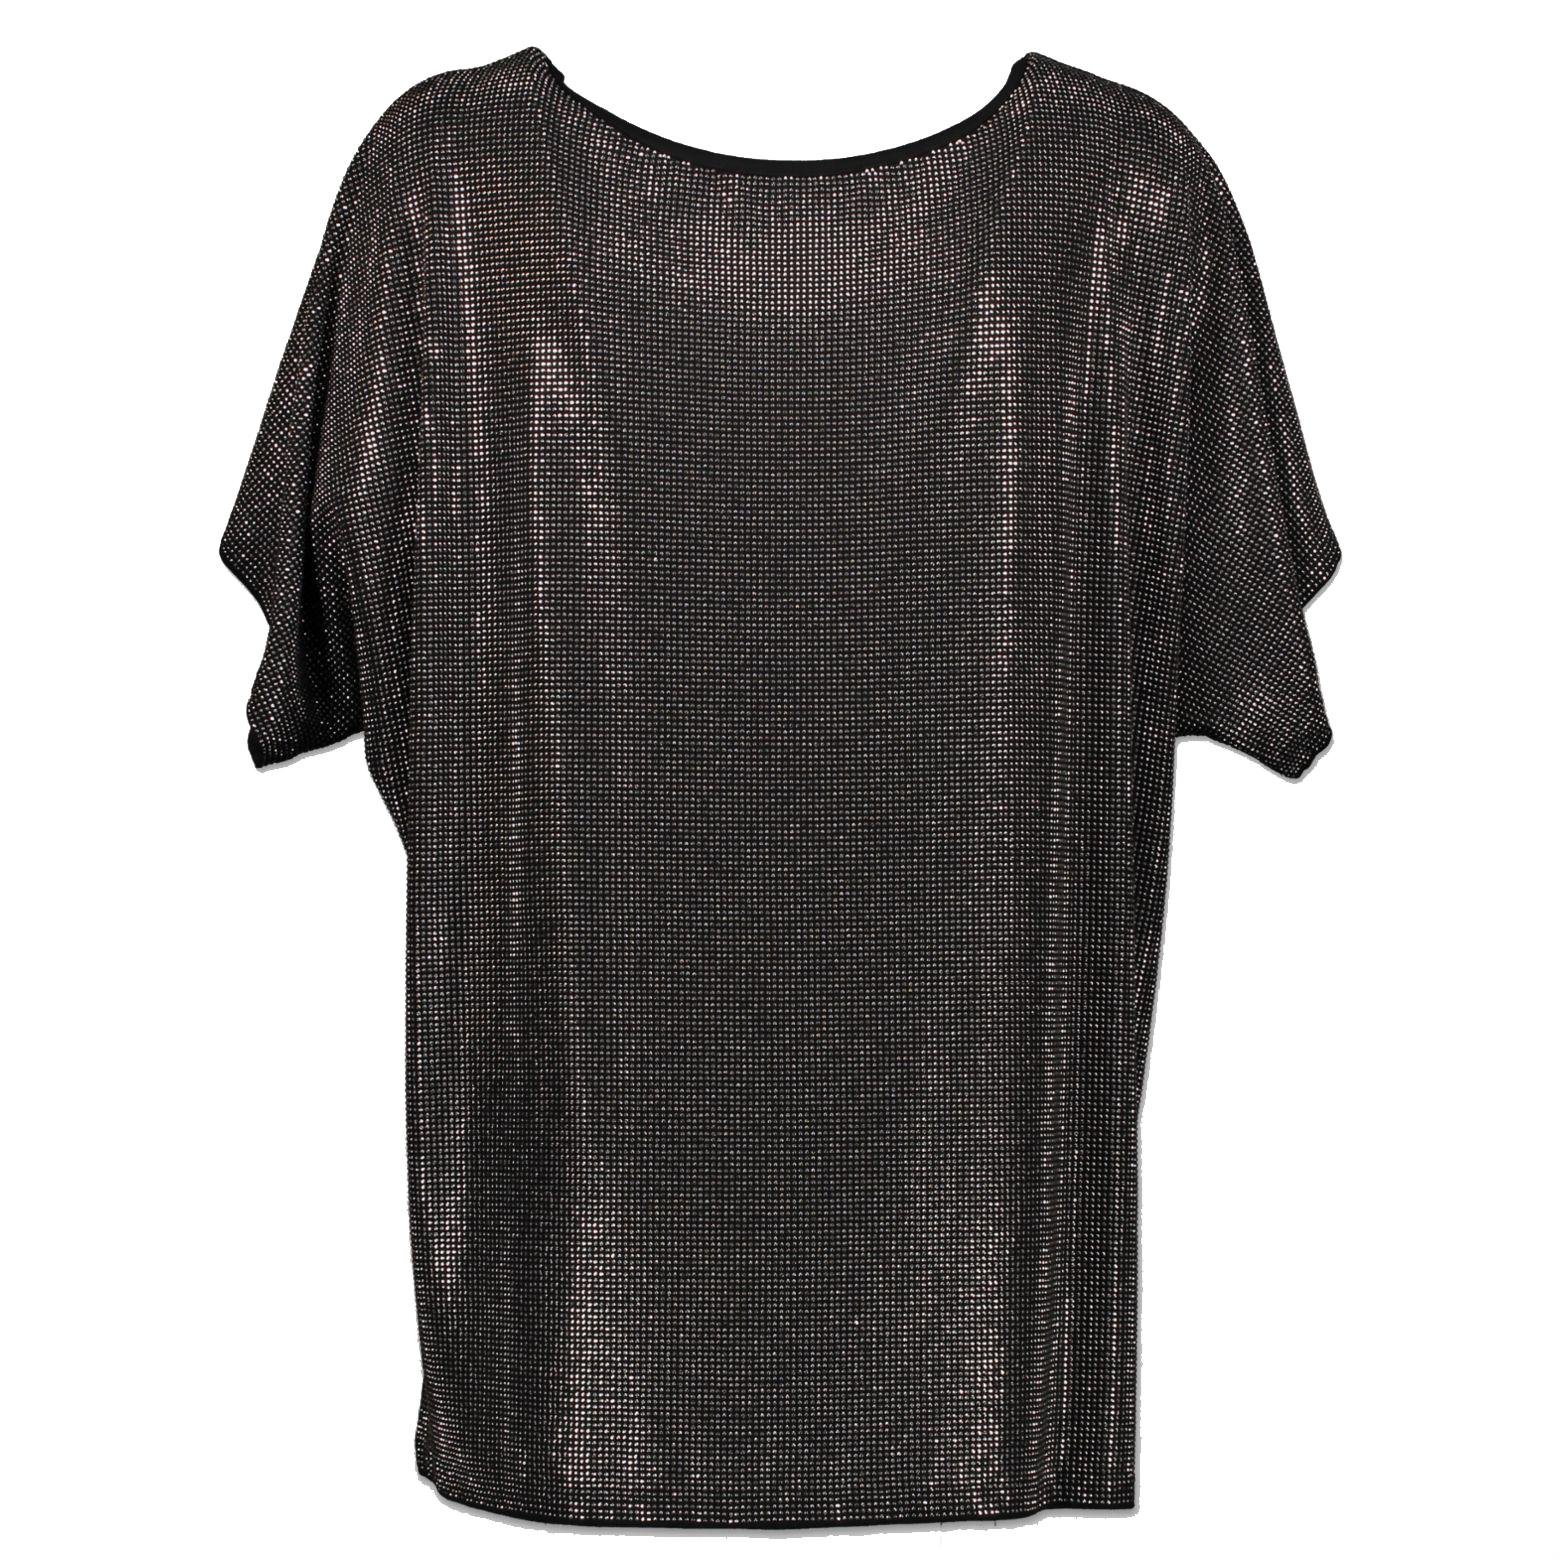 Pierre Balmain Black Metallic Stud T-Shirt